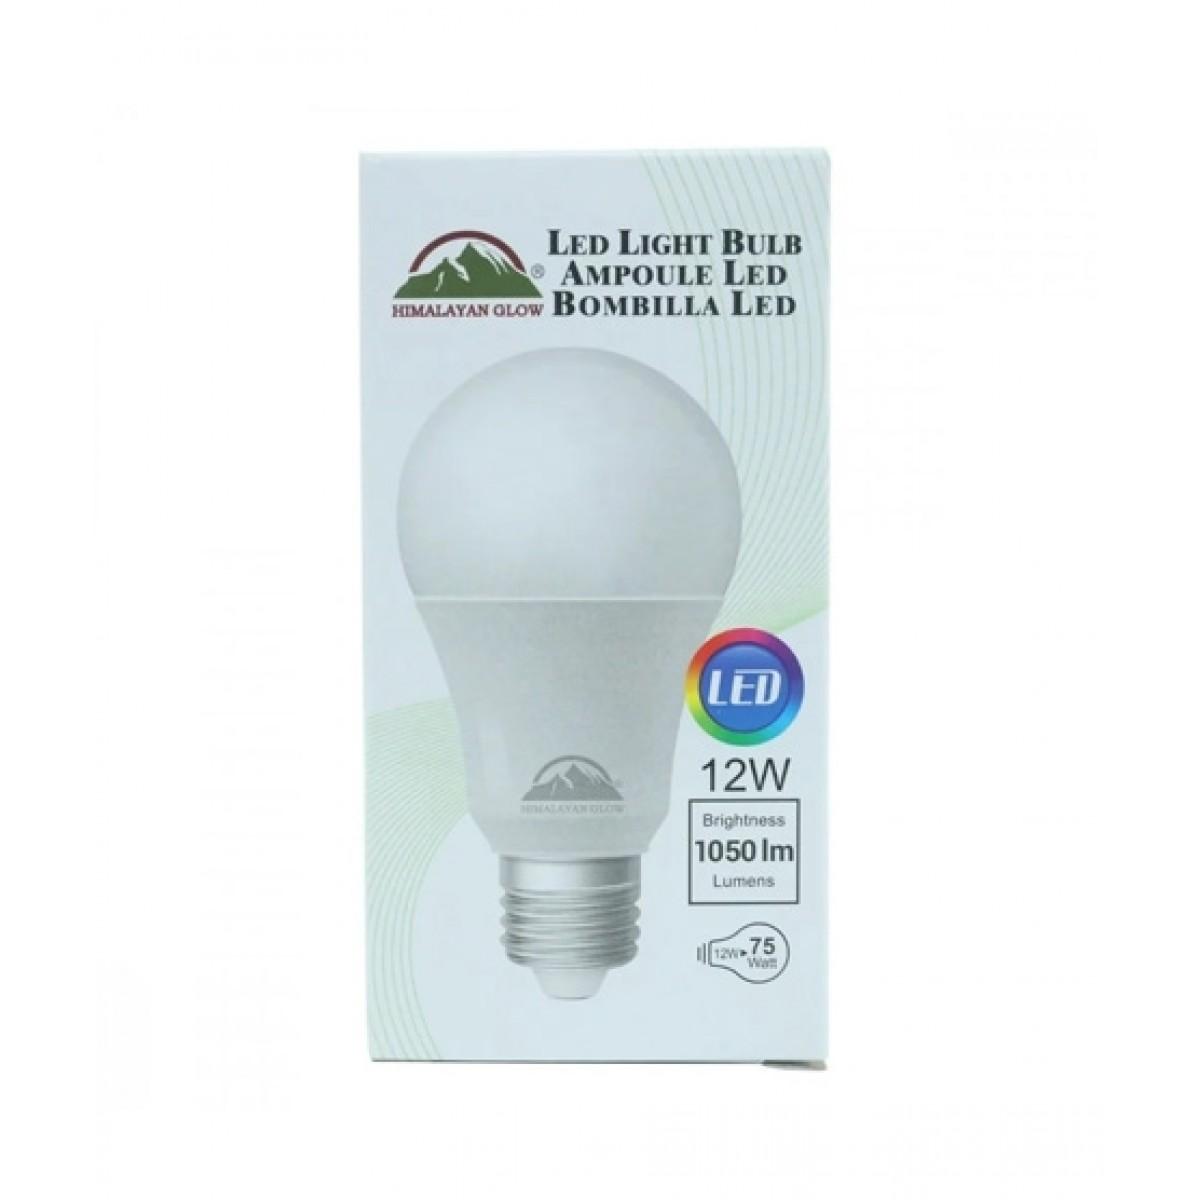 Himalayan Glow Cool White LED Light Bulb 12W